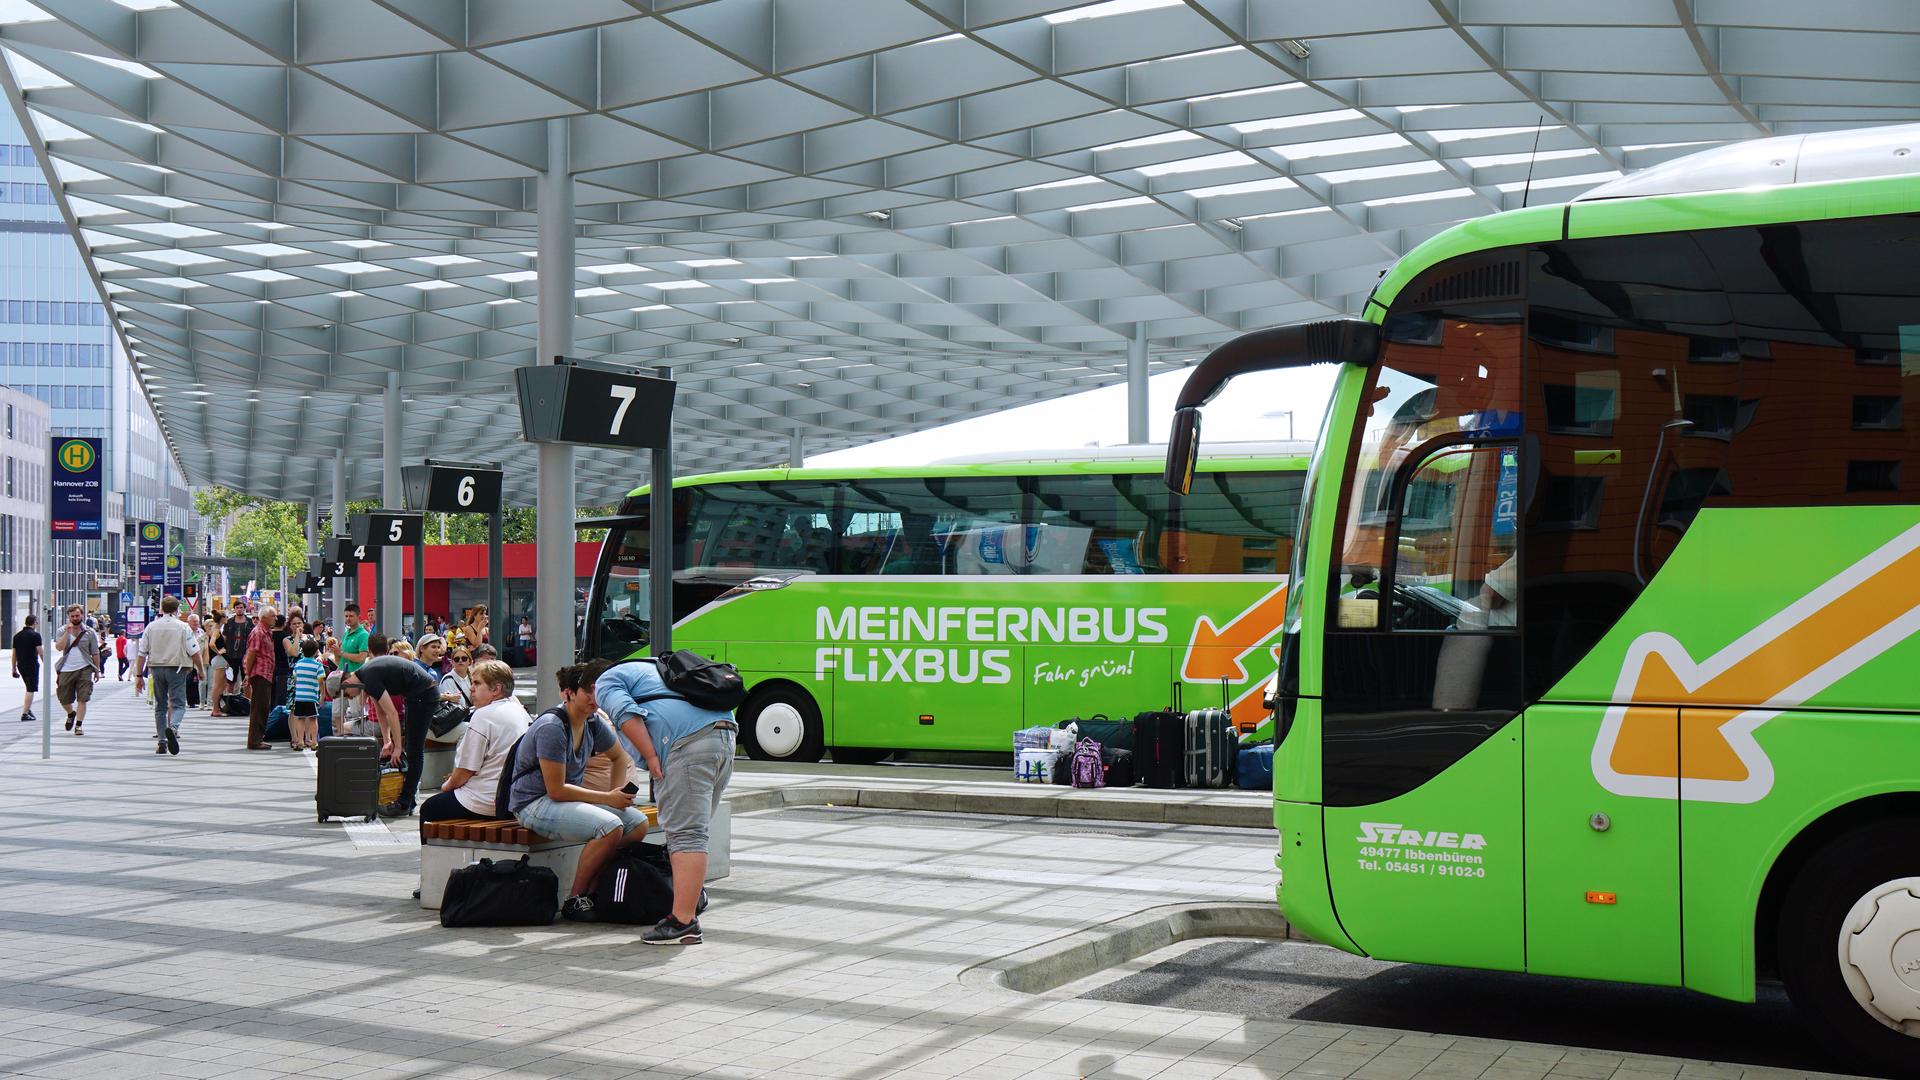 Flixbus, Europe's Growing Intercity Bus Service, Comes